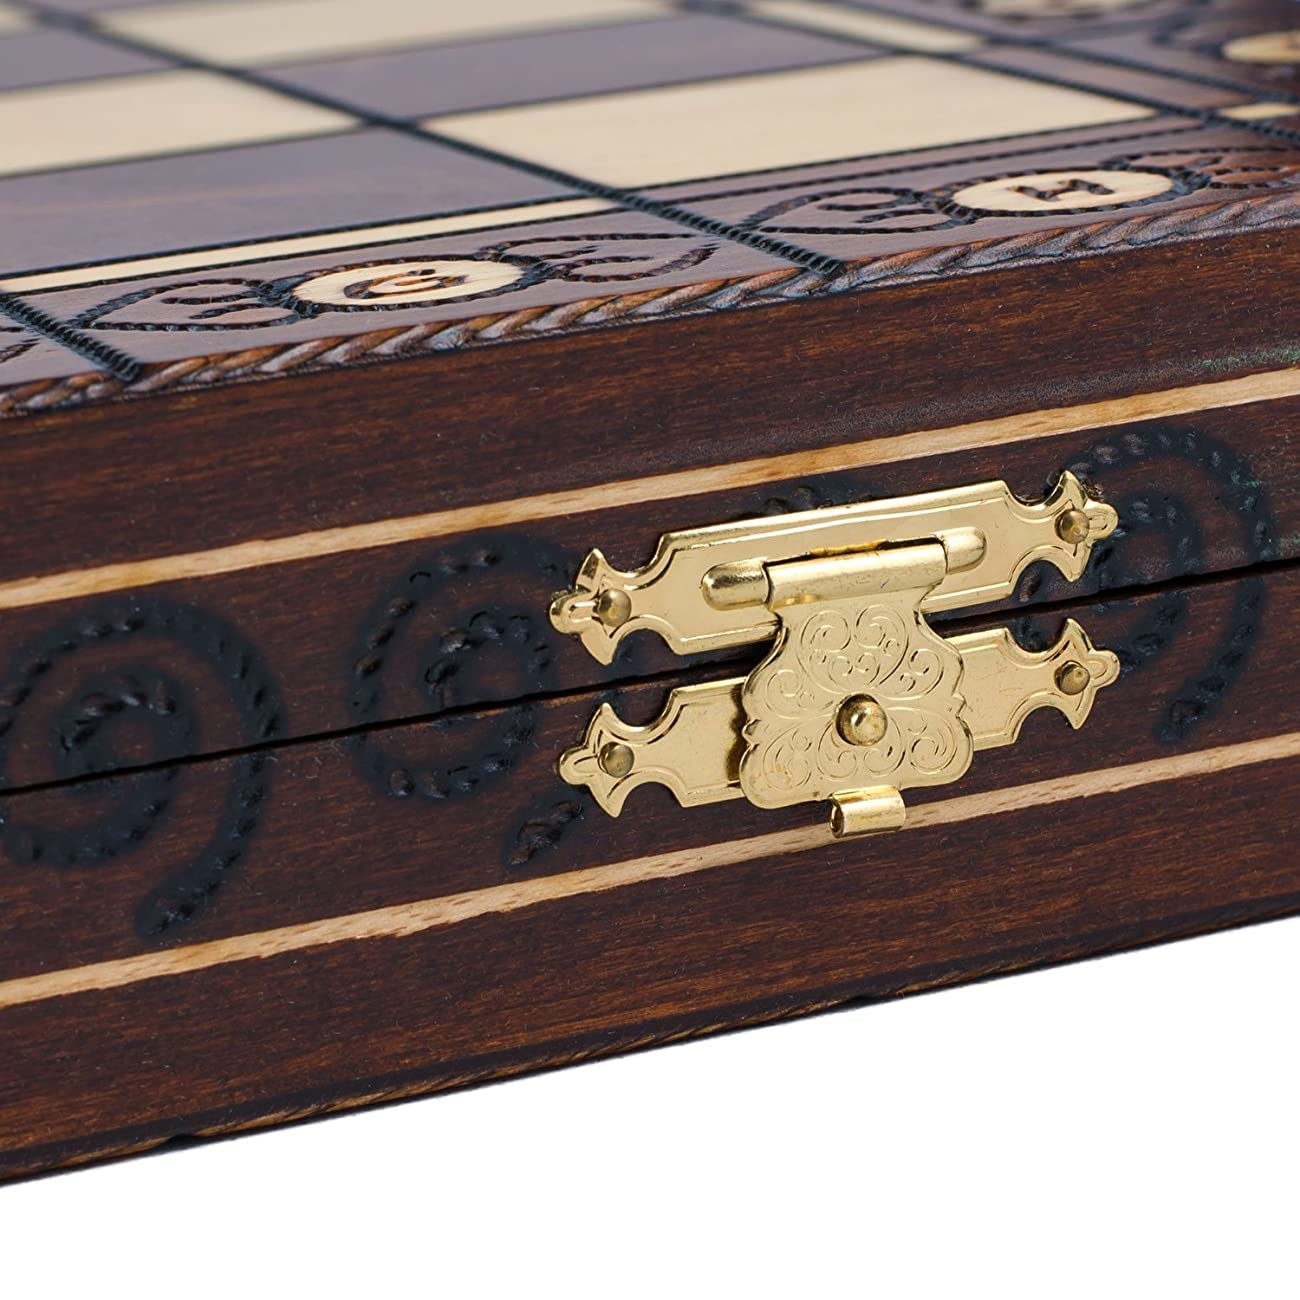 Wegiel Chess Set - Consul Chess Pieces and Board - European Wooden Handmade Game 3